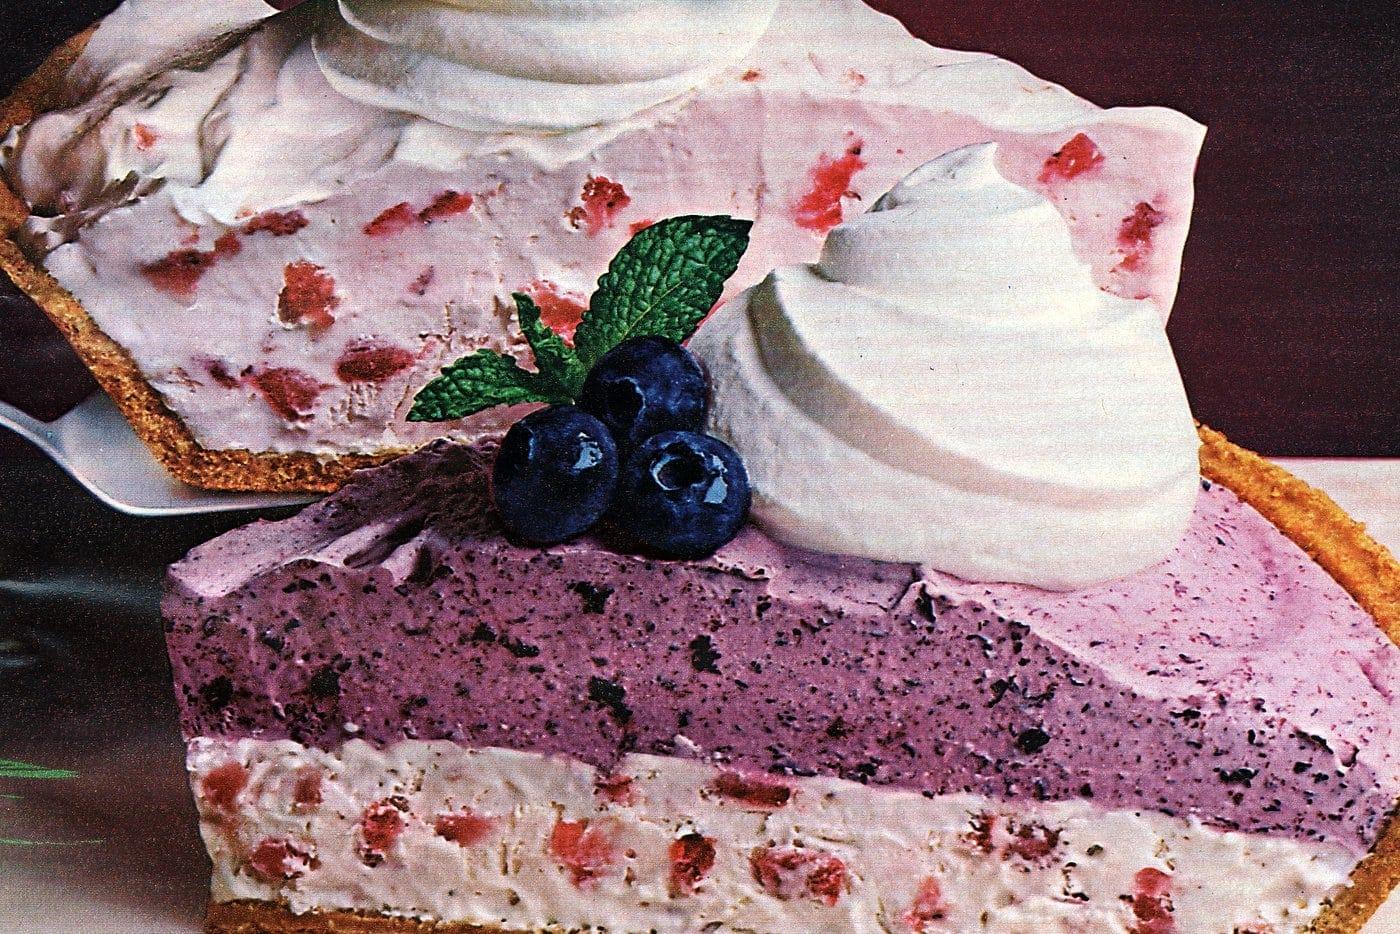 Fruity Yoplait yogurt pies Strawberry Supreme Double Fruit Fantastique from 1985